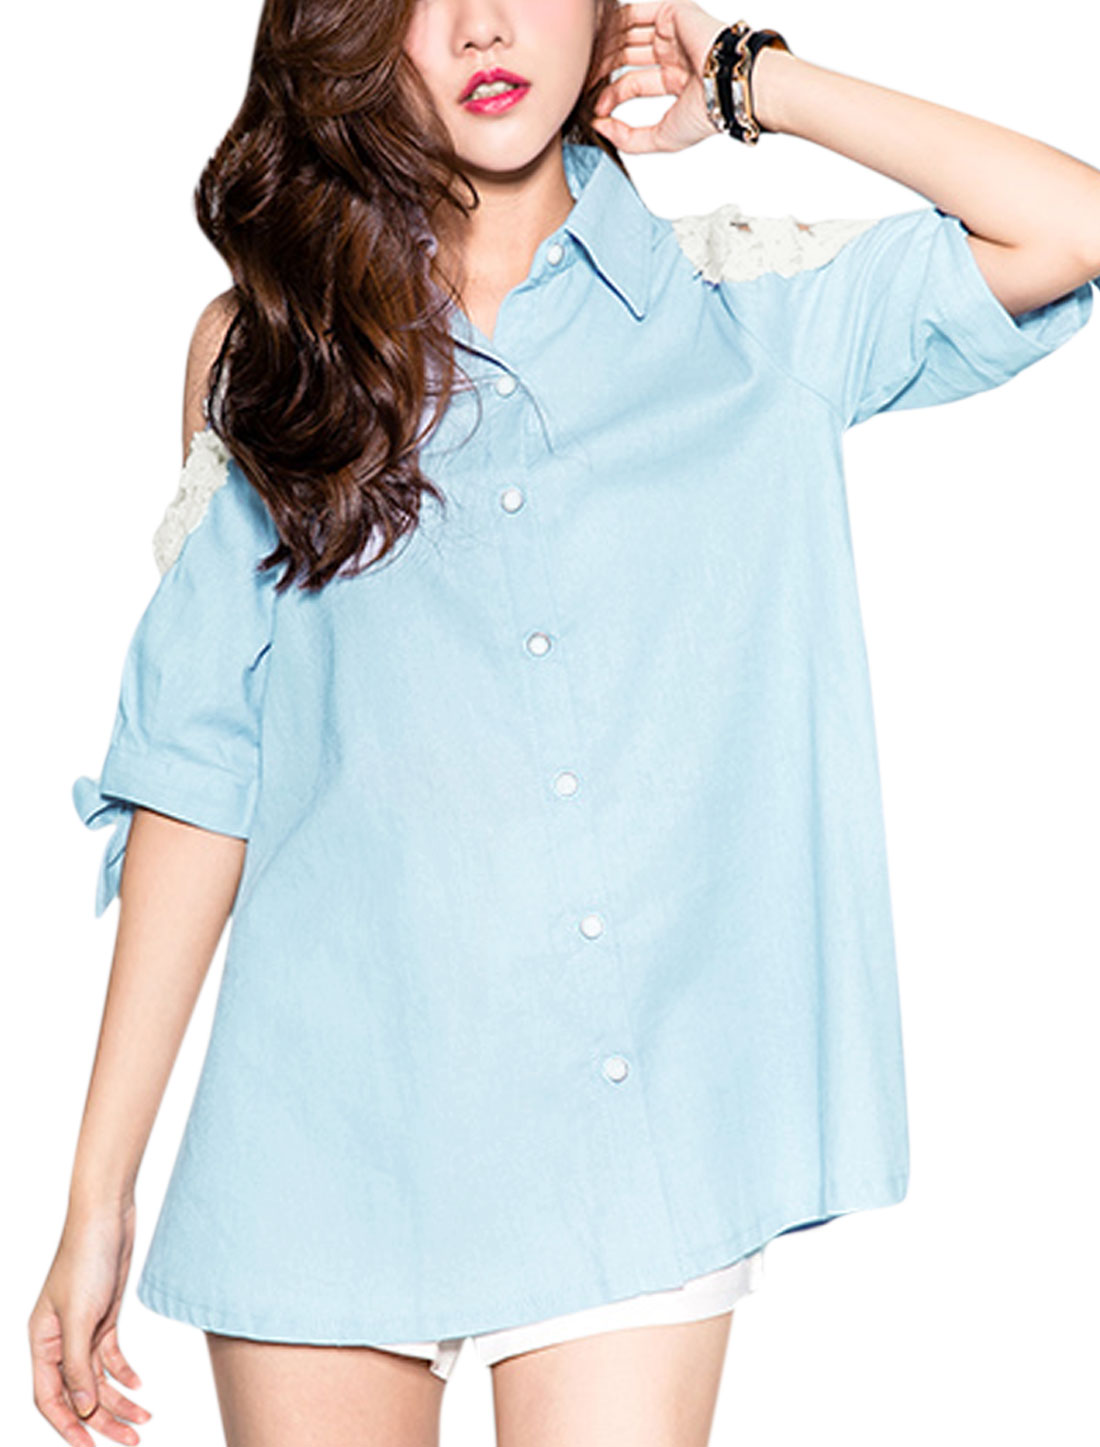 Women Point Collar Crochet Panel Self Tie Cuffs Tunic Shirts Light Blue XS